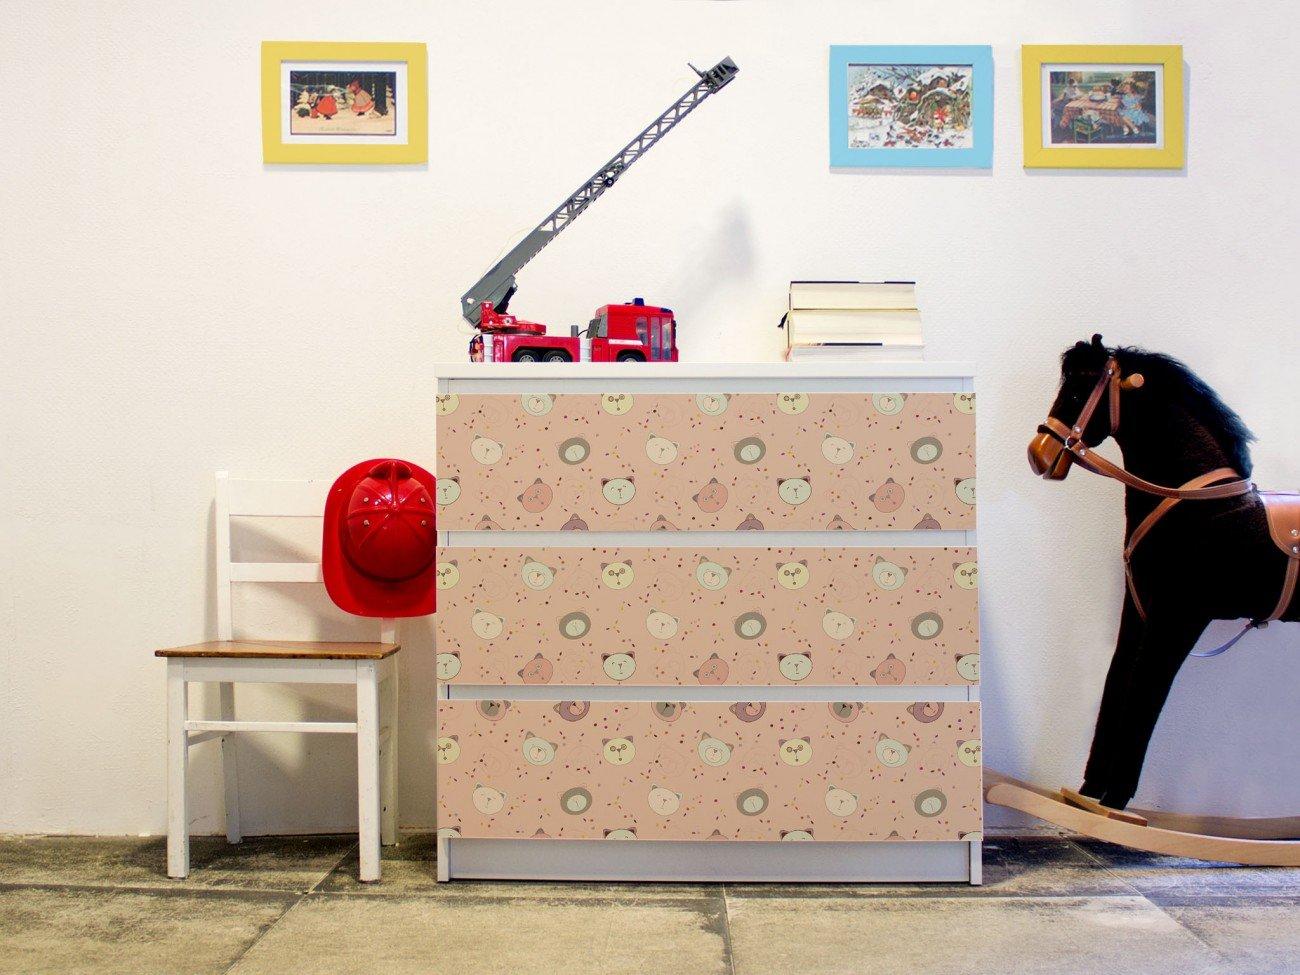 M/öbelaufkleber 3-teilig ca 80x78cm banjado YOURDEA M/öbelFolie f/ür IKEA Malm Kommode mit 3 Schubladen Perfekt f/ür Das Kinderzimmer M/öbelsticker Selbstklebend mit Motiv B/ärchen